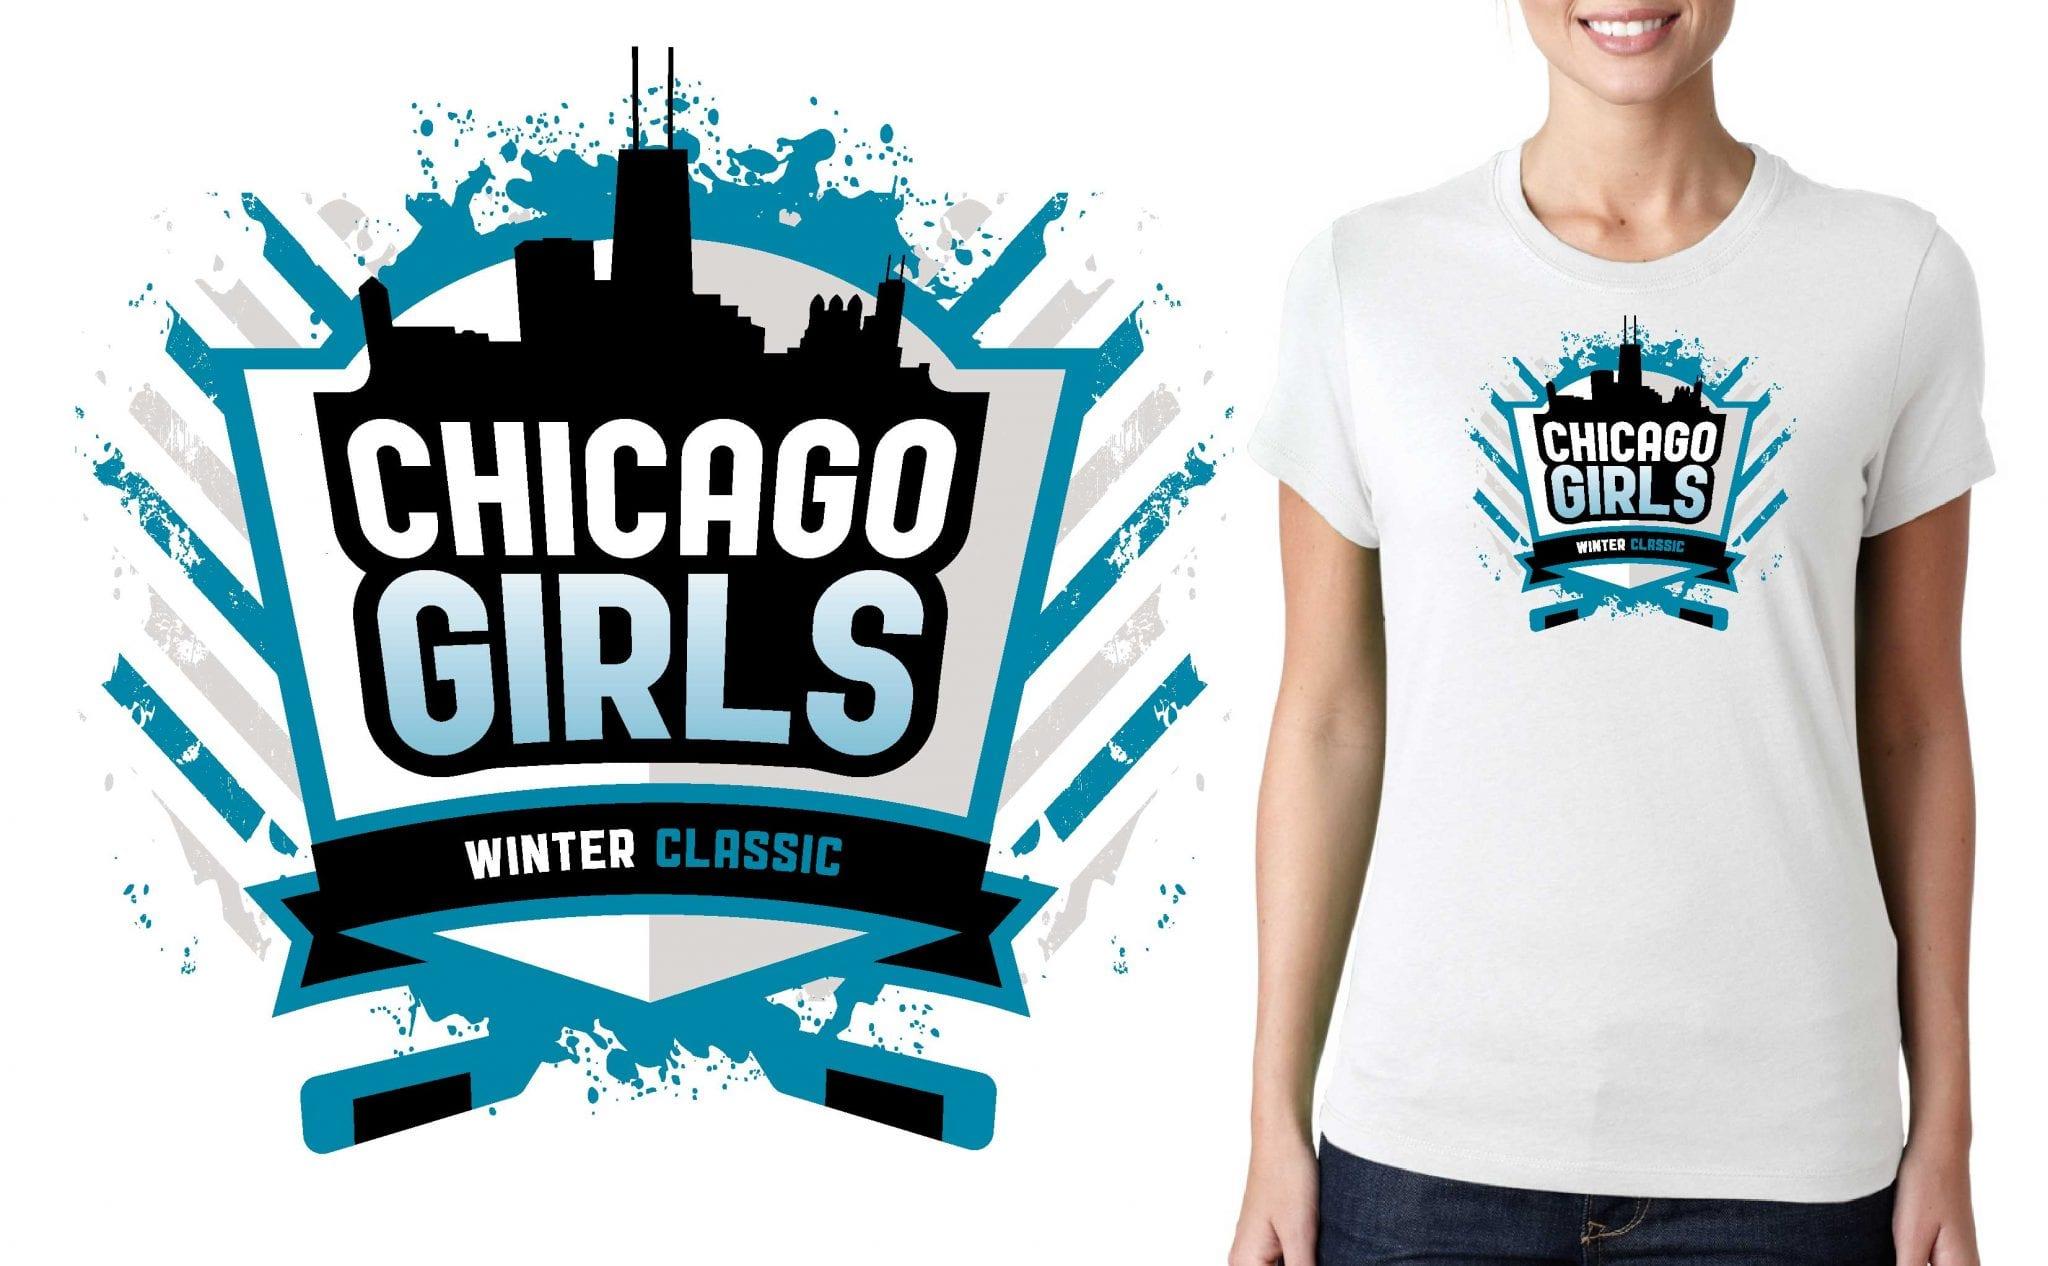 PRINT 1 14 15 17 Canlan Chicago Girls Winter Classic vector logo design for t-shirt ice hockey urartstudio.com